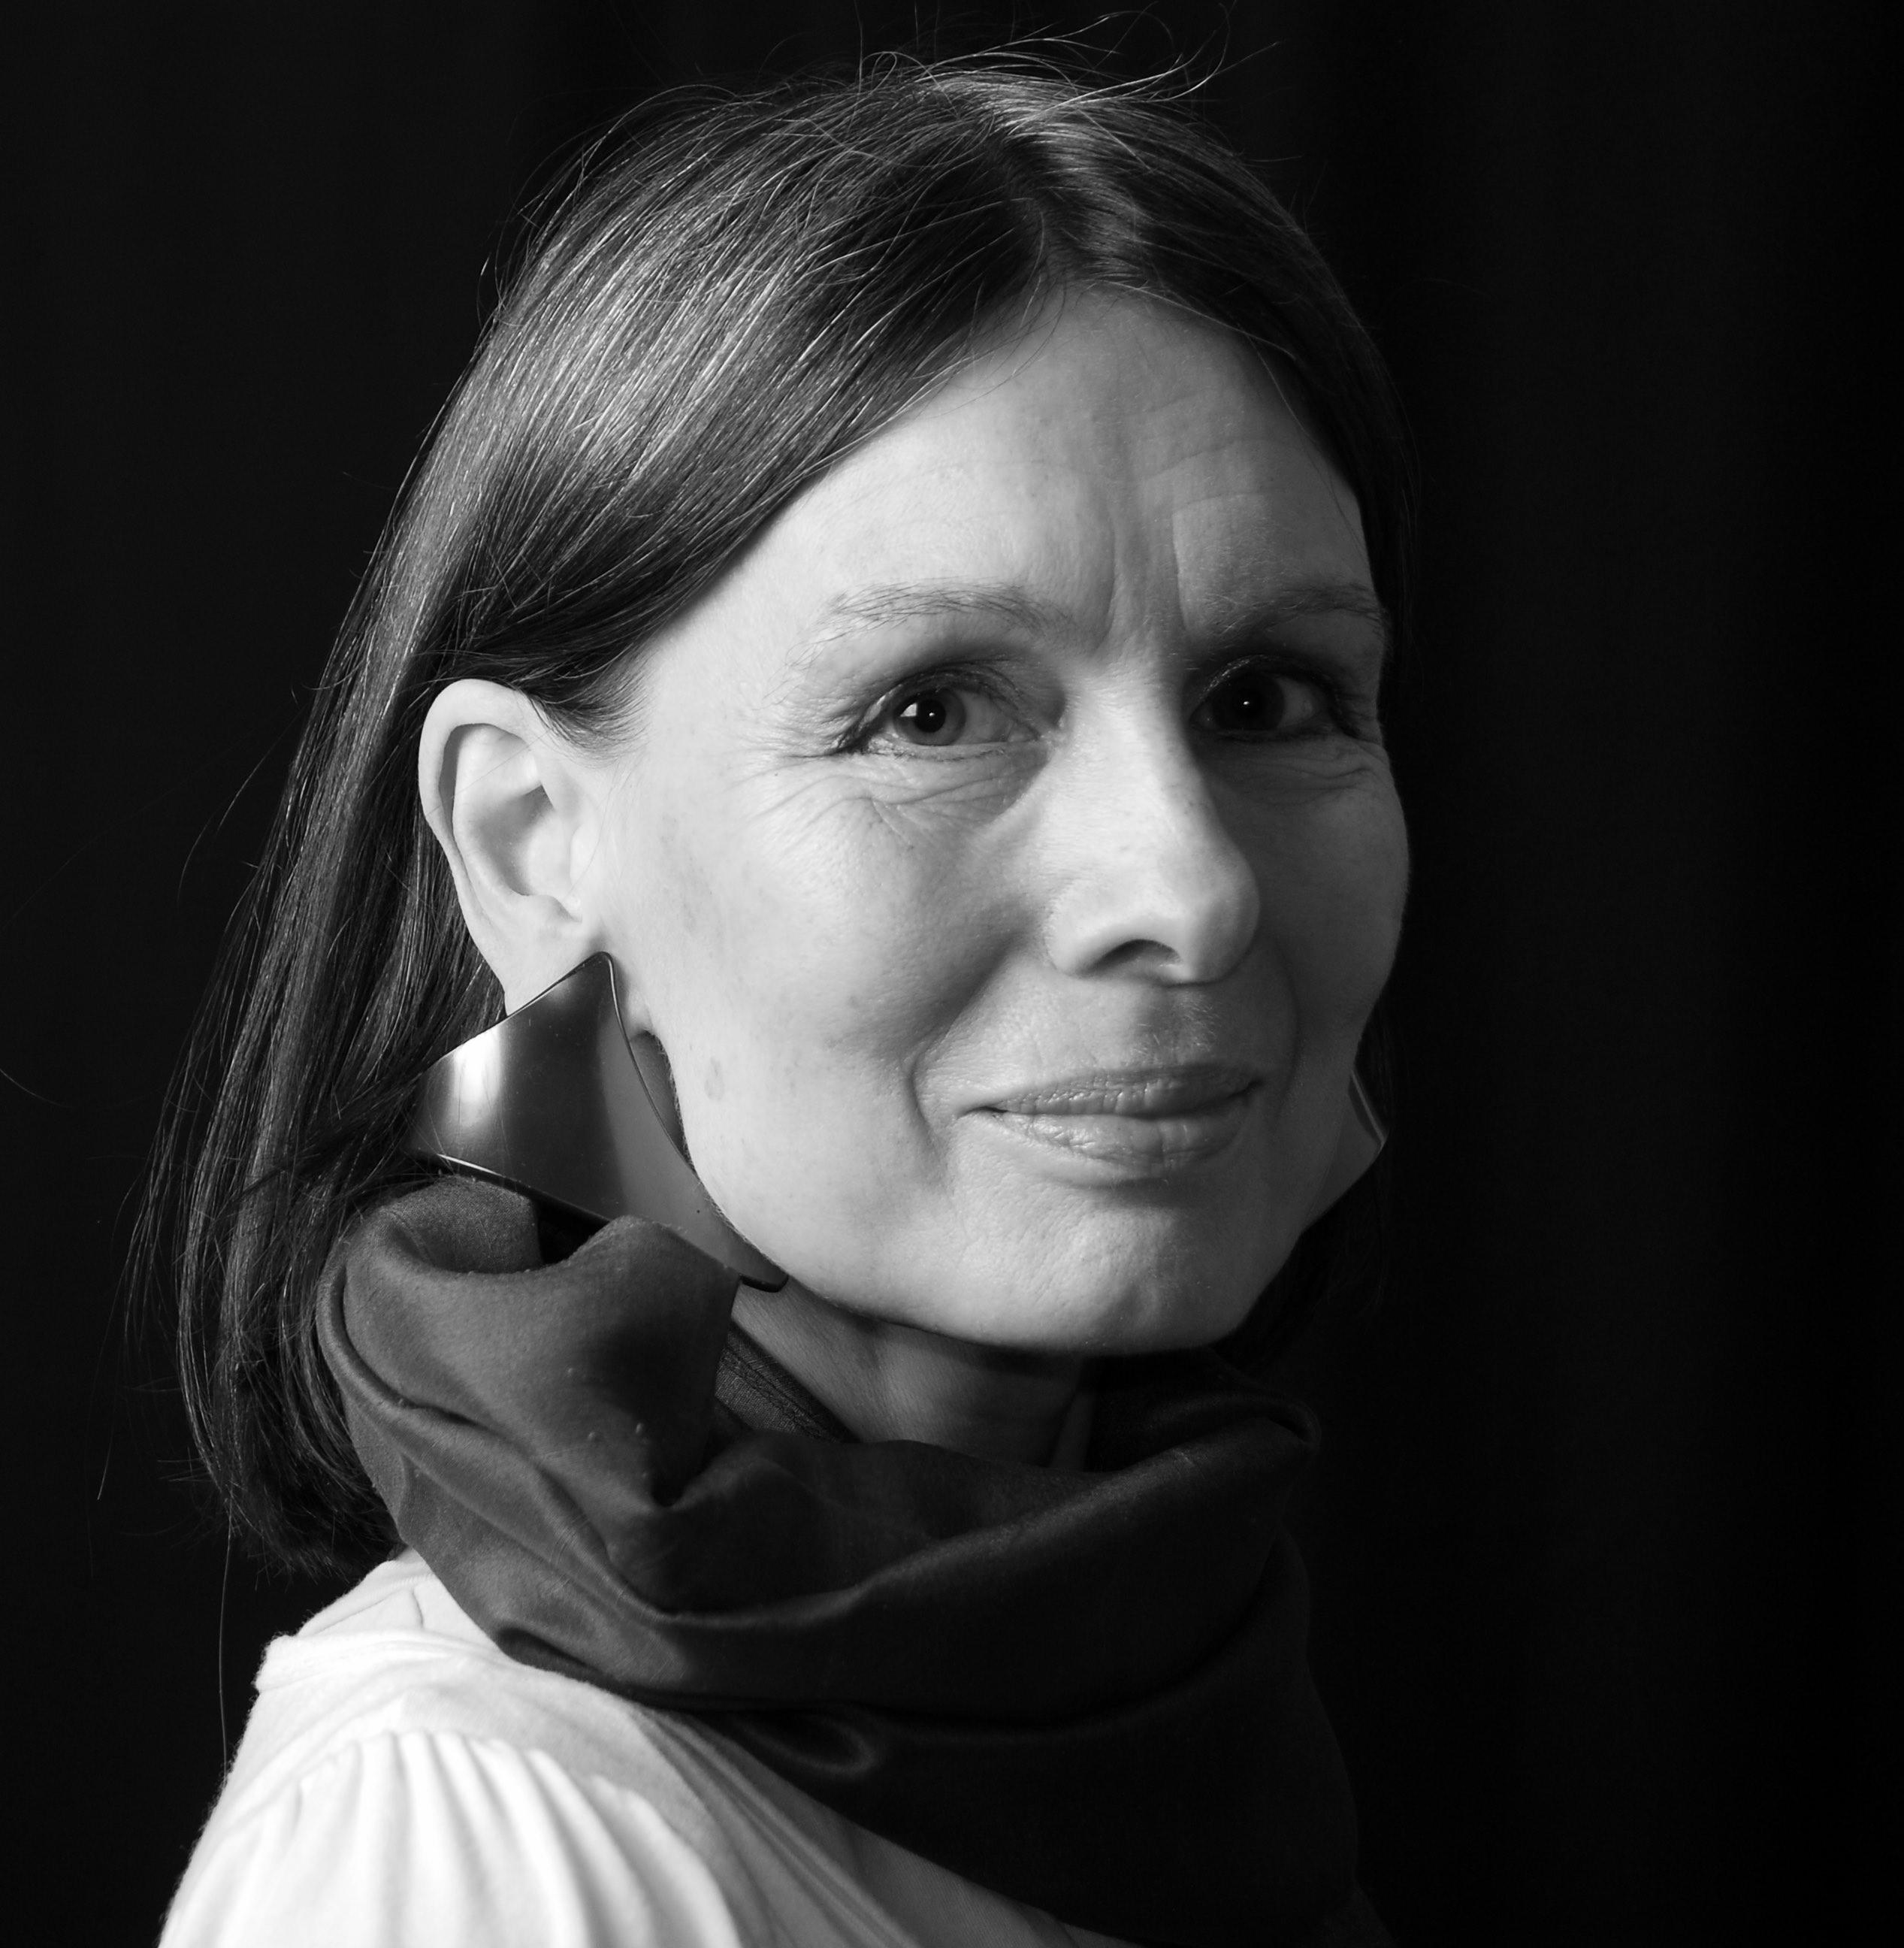 Andrea Schomburg